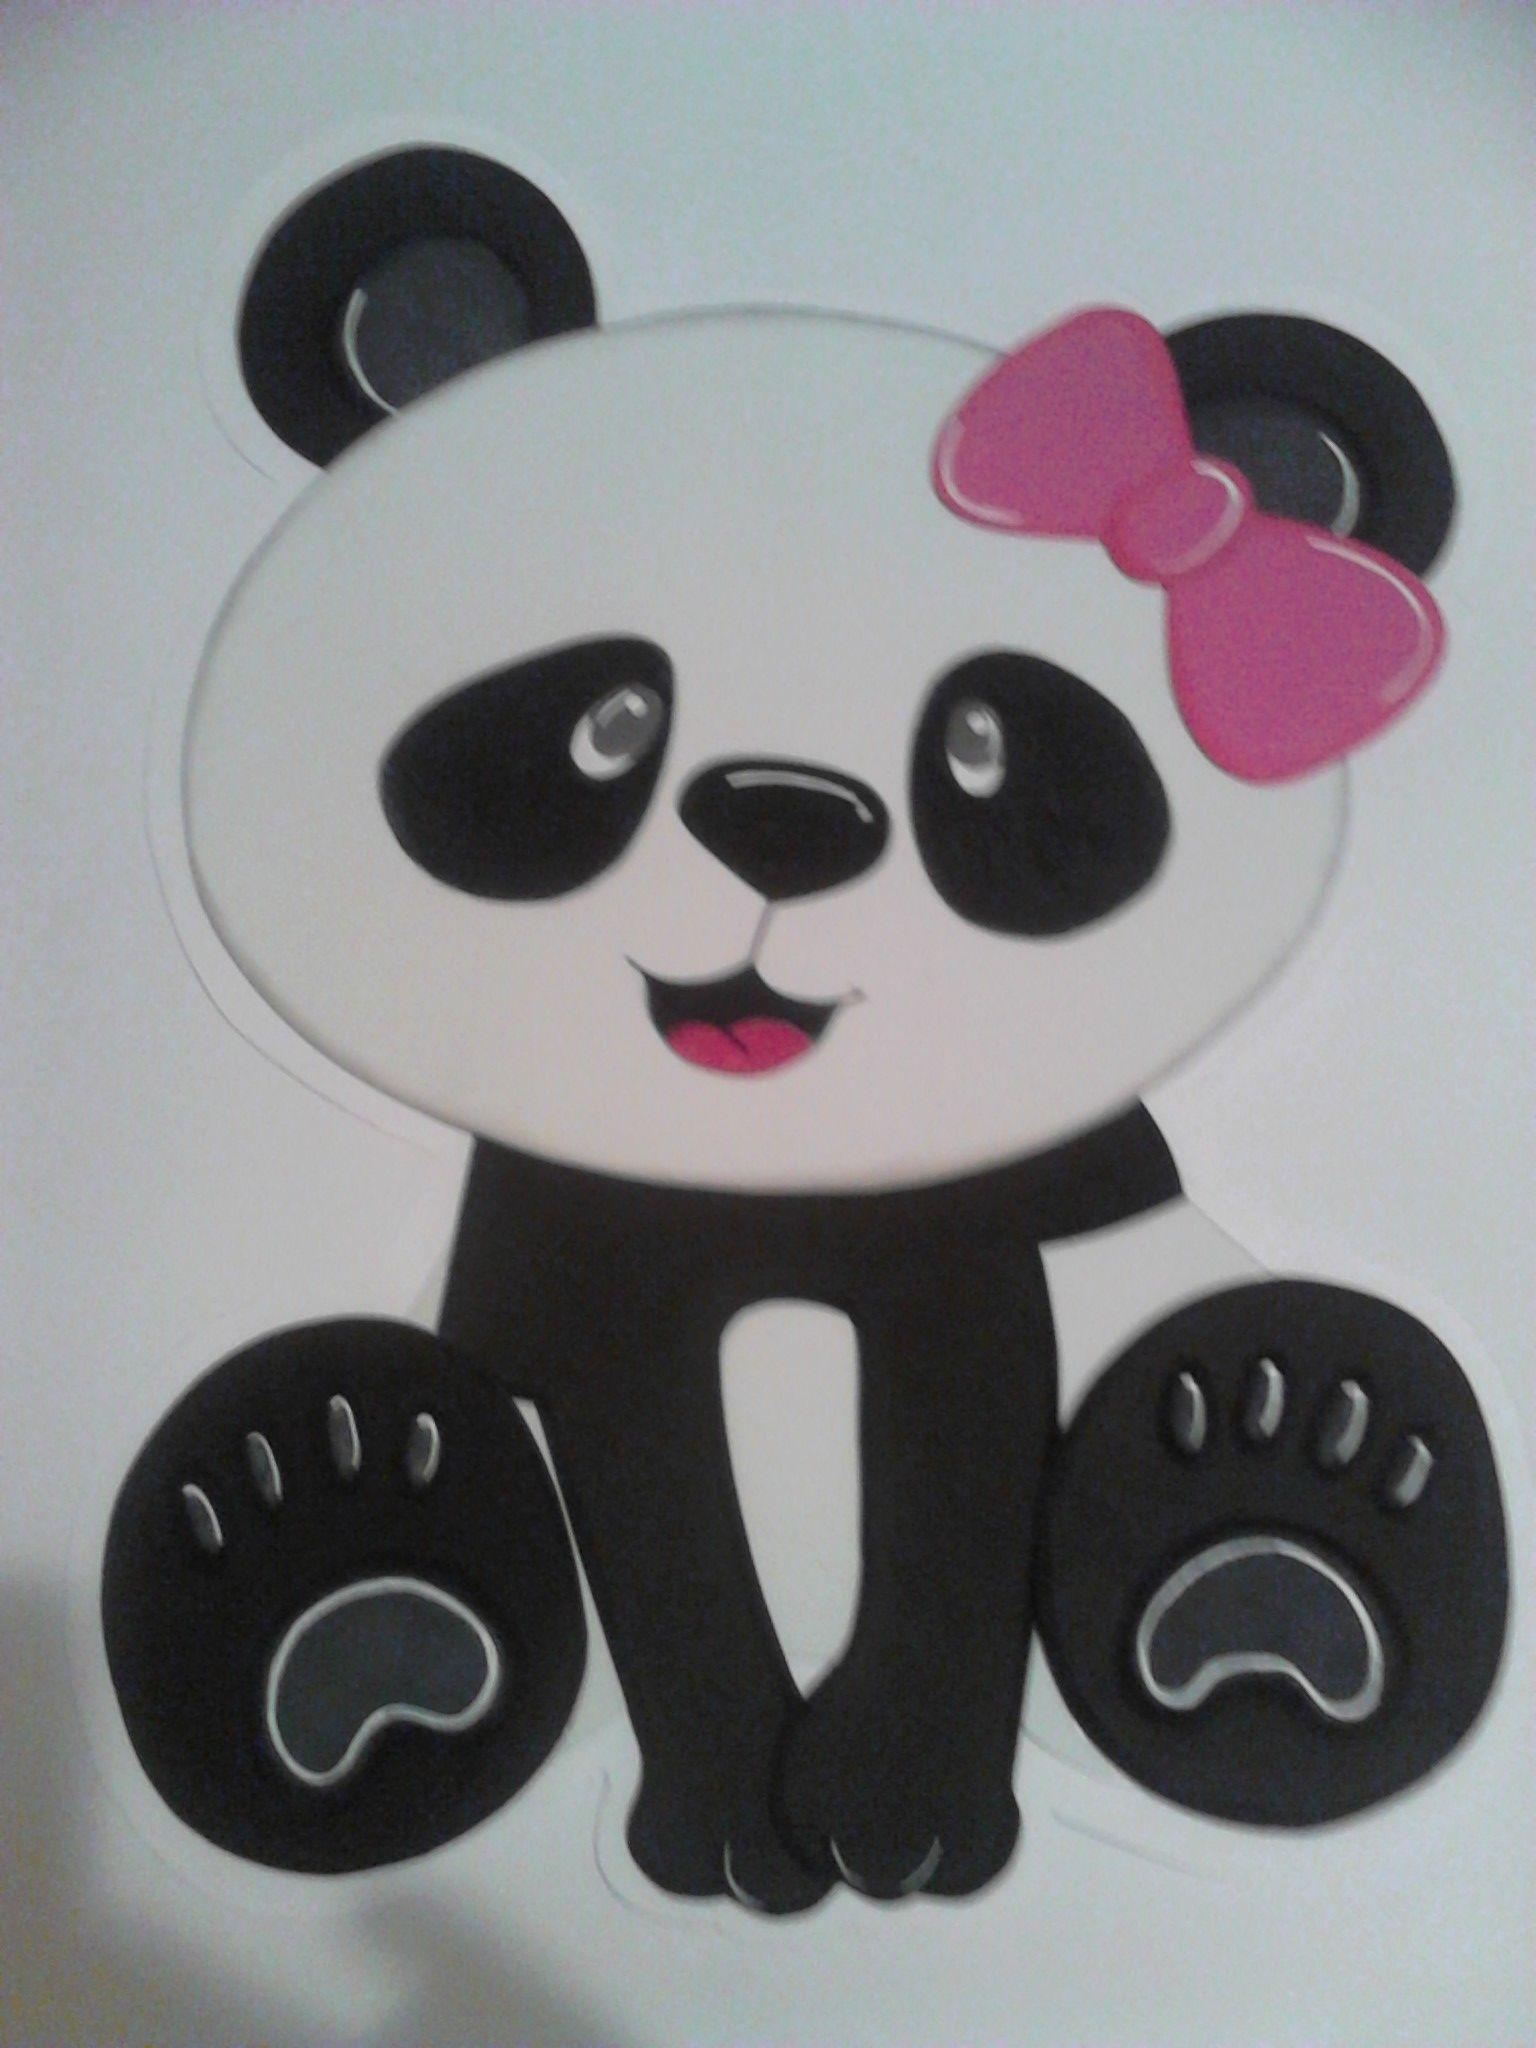 Dibujo en foam para pared fiesta tem tica de pandas para - Dibujos para paredes ...